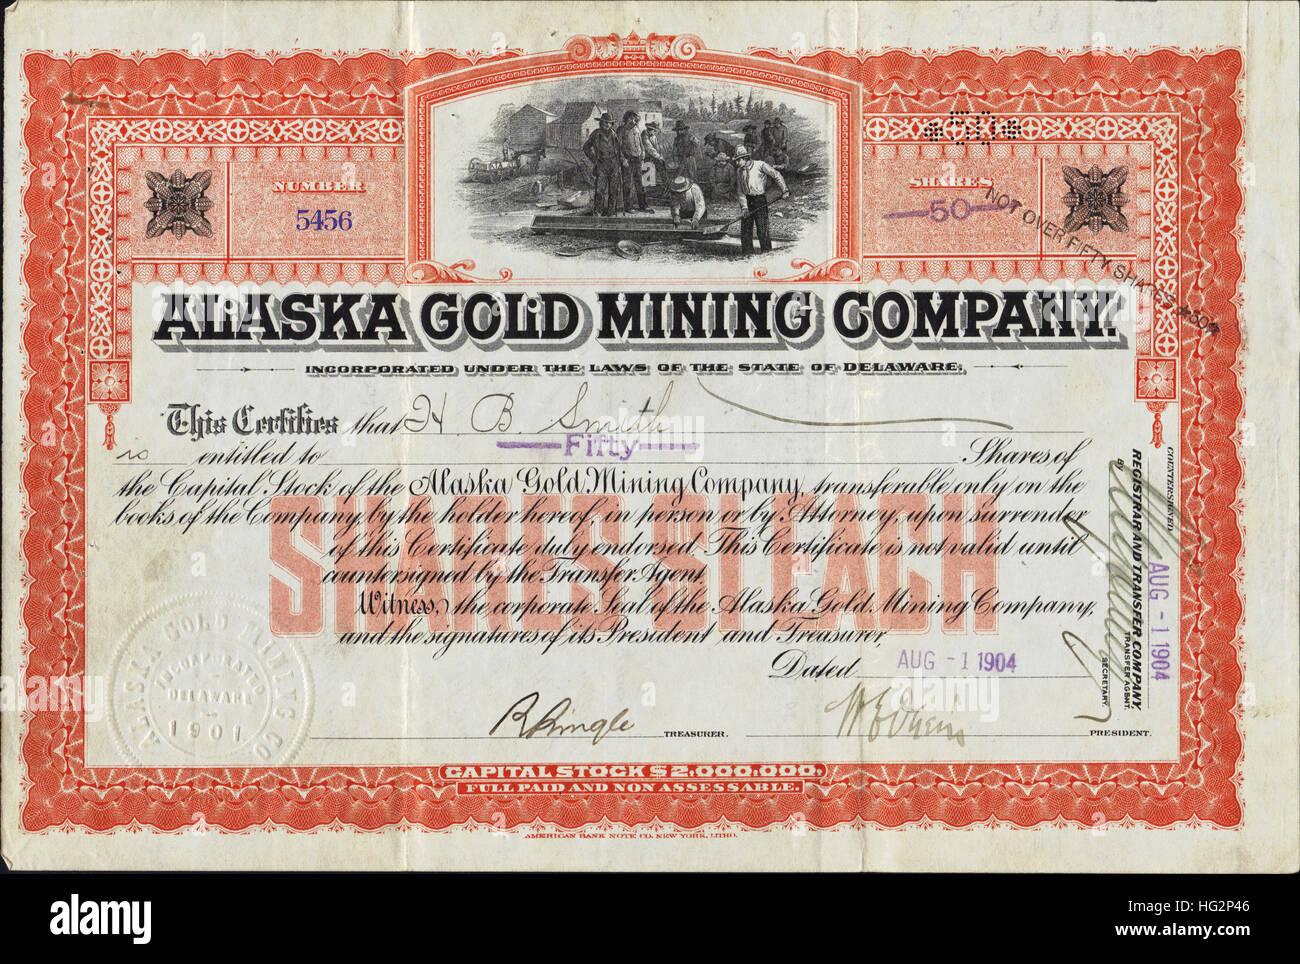 1904 Alaska Gold Mining Company Stock Certificate - USA - Stock Image